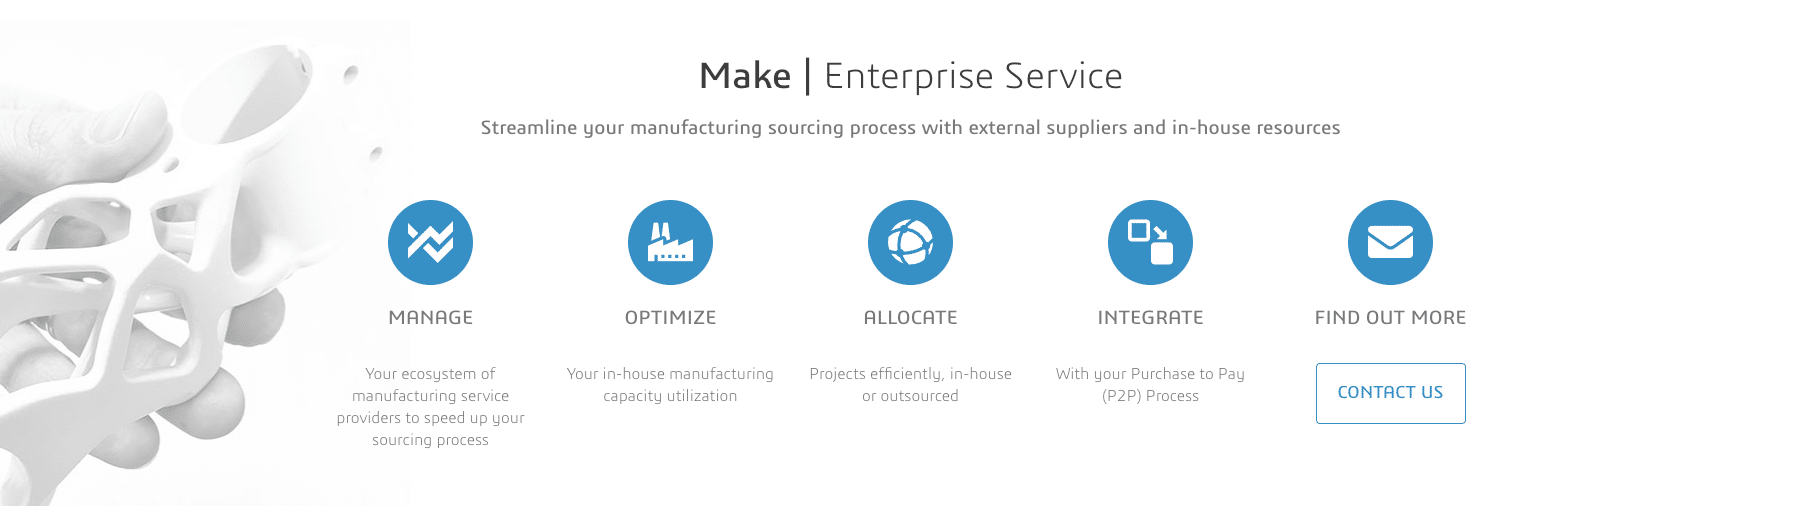 3DEXPERIENCE Make Enterprise Service